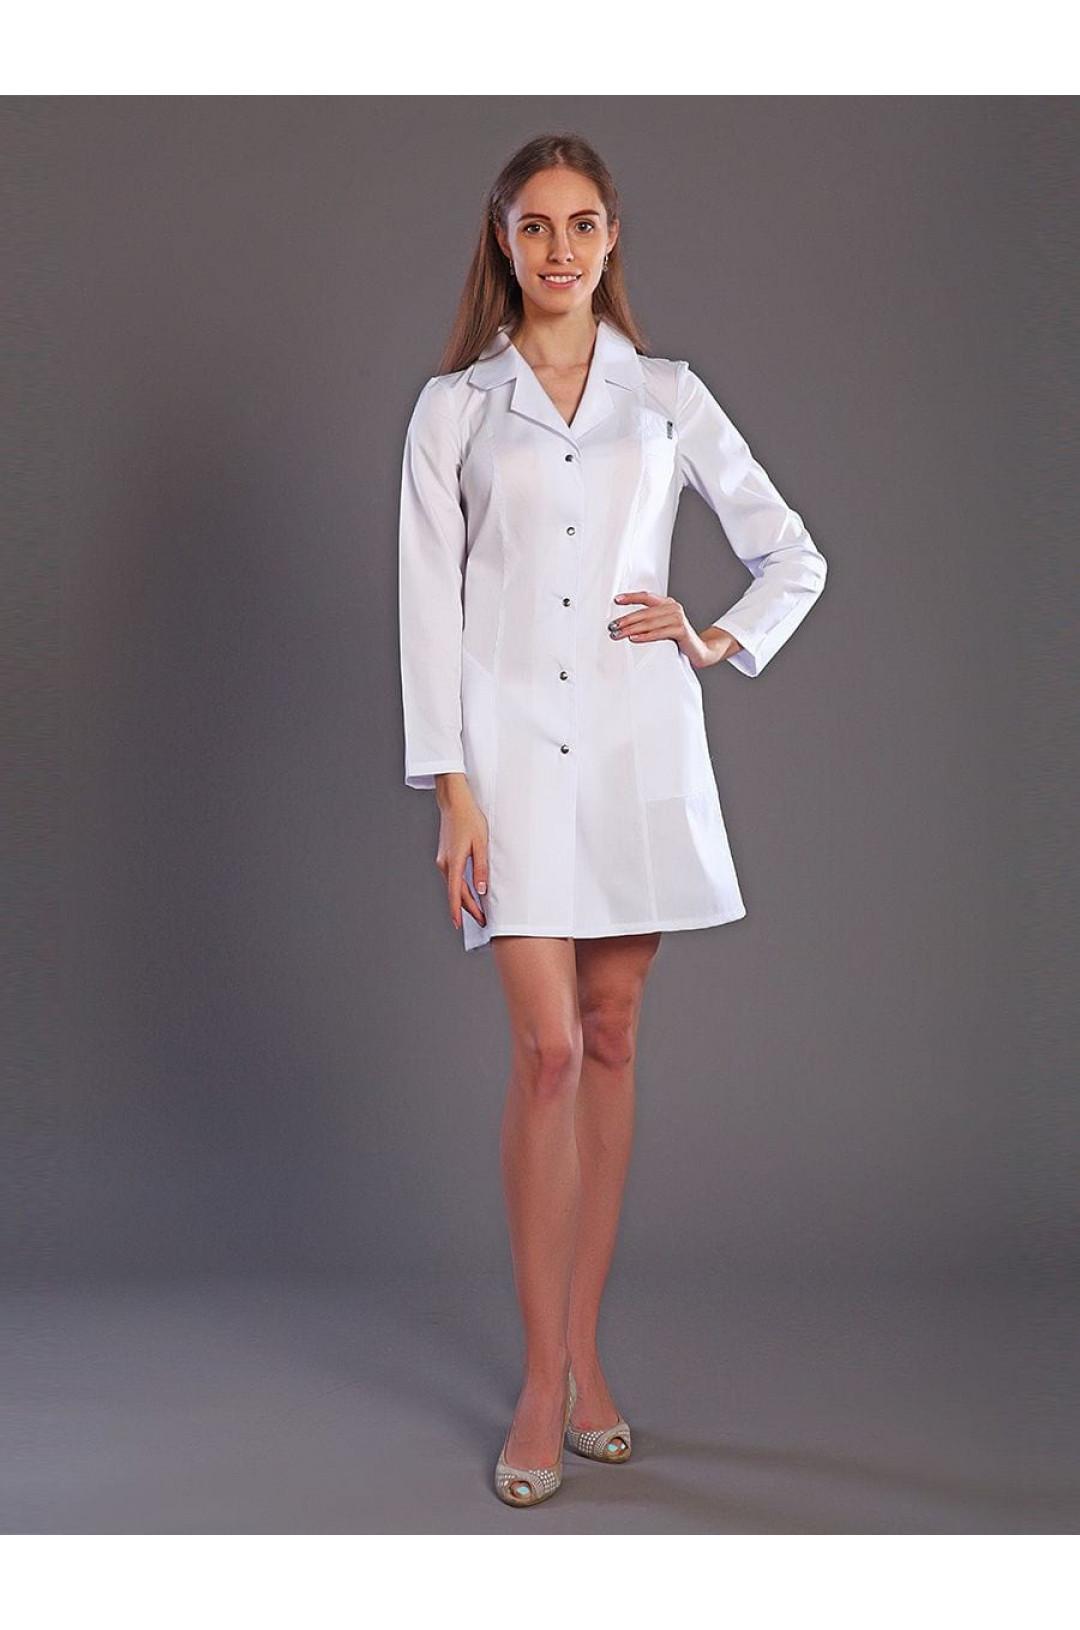 Халат медицинский женский М-05 (белый, тиси)